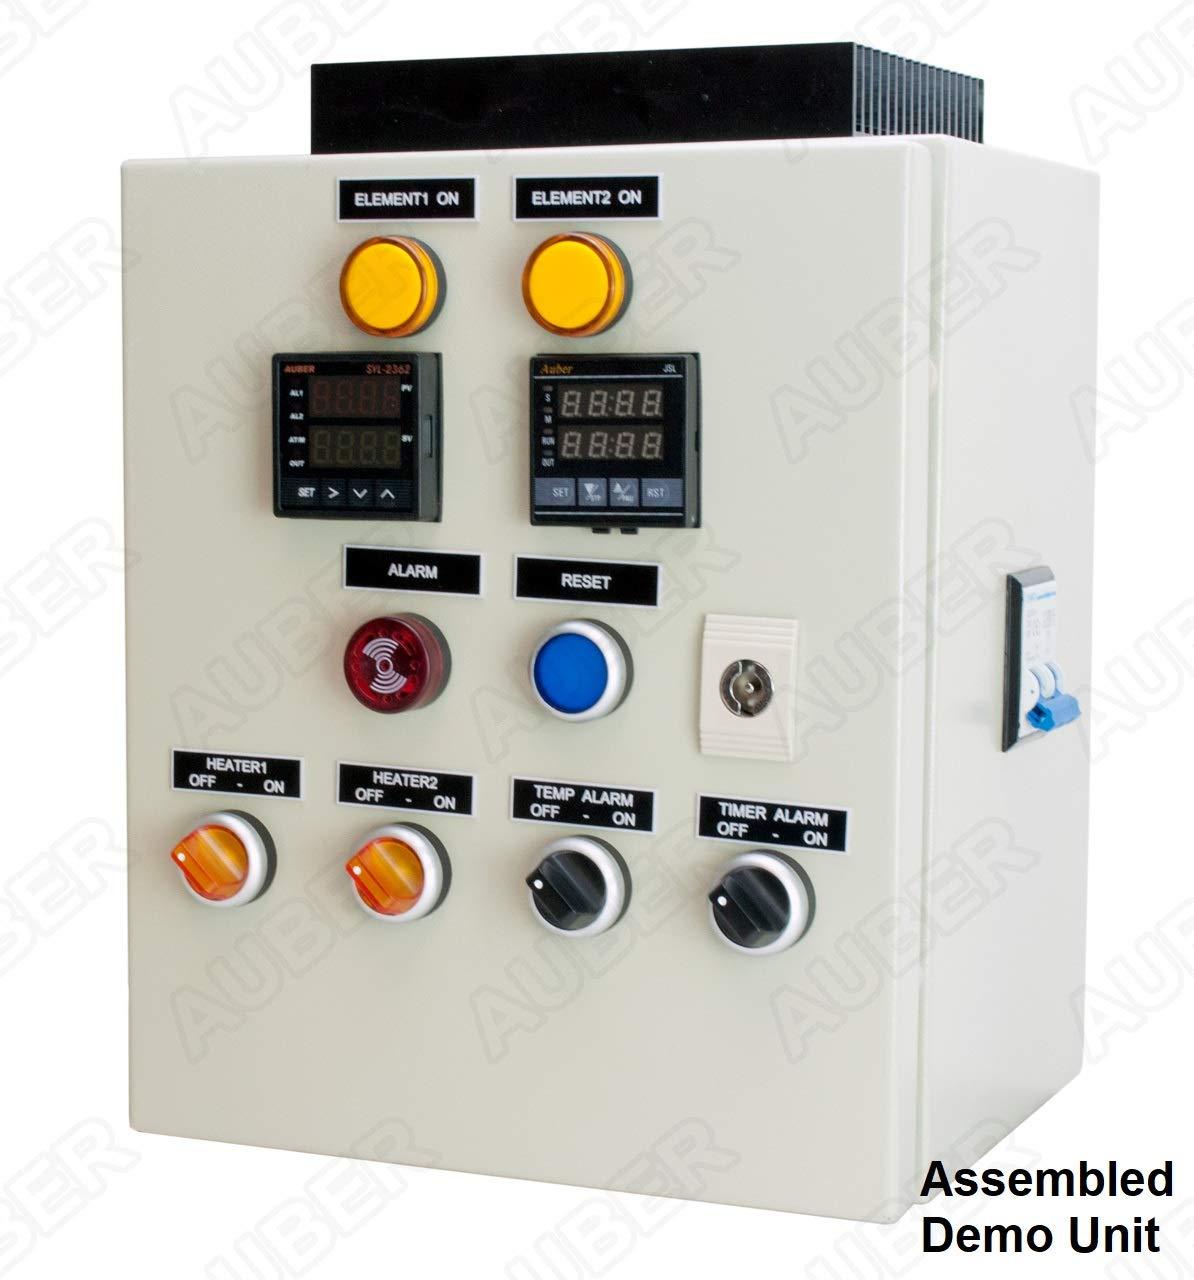 Powder Coating Oven Controller Kit, 240V 50A 12000W (KIT-PCO2) - -  Amazon.com